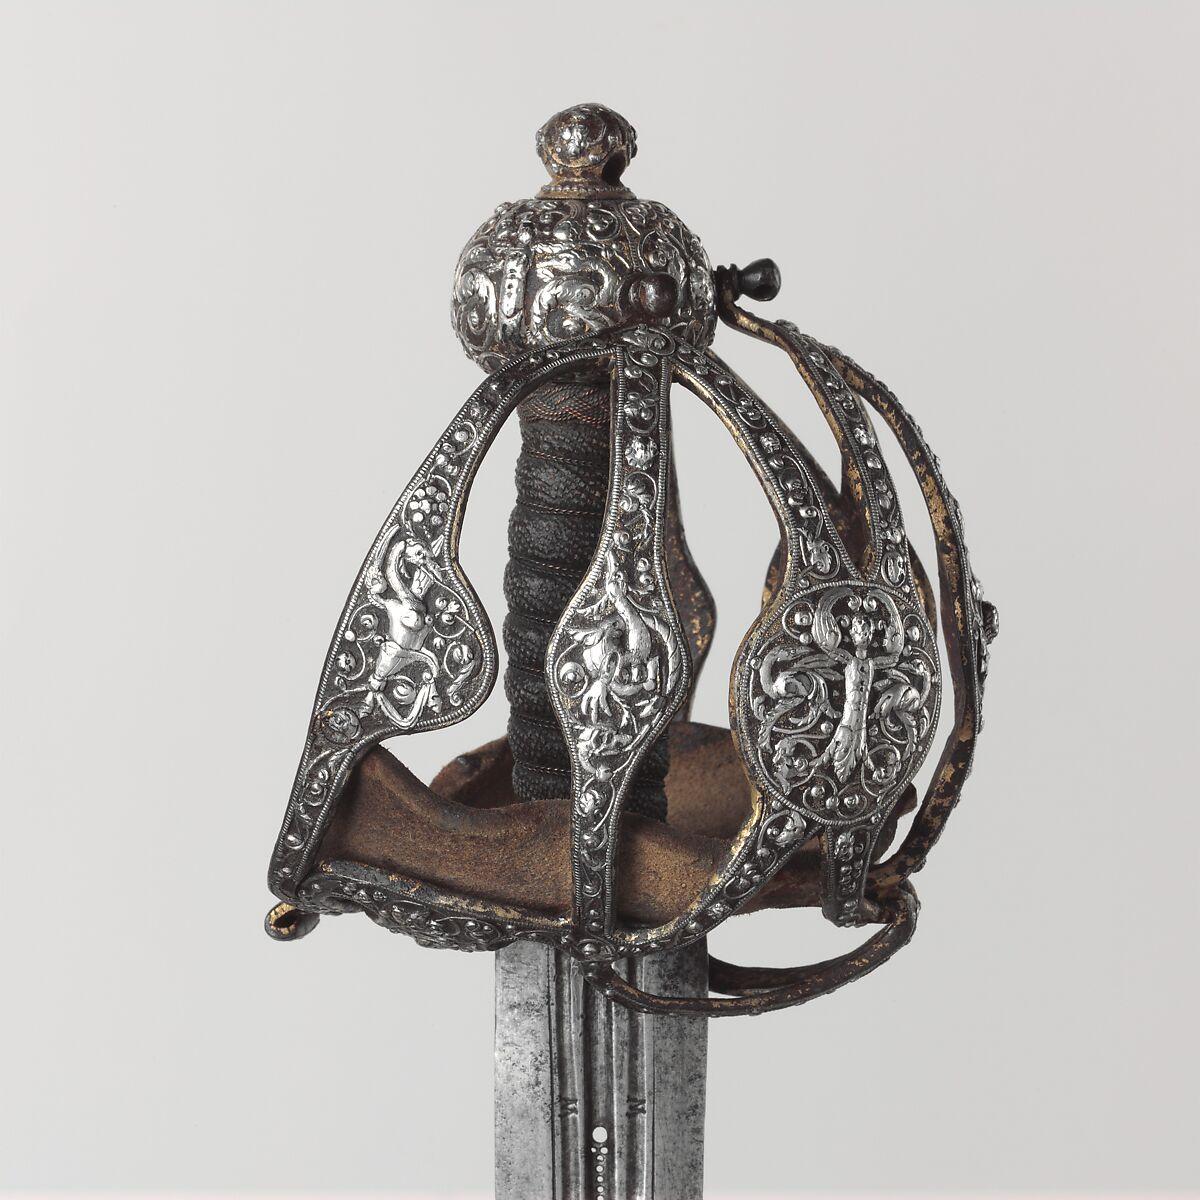 Basket-Hilted Sword, Steel, silver, gold, leather, British